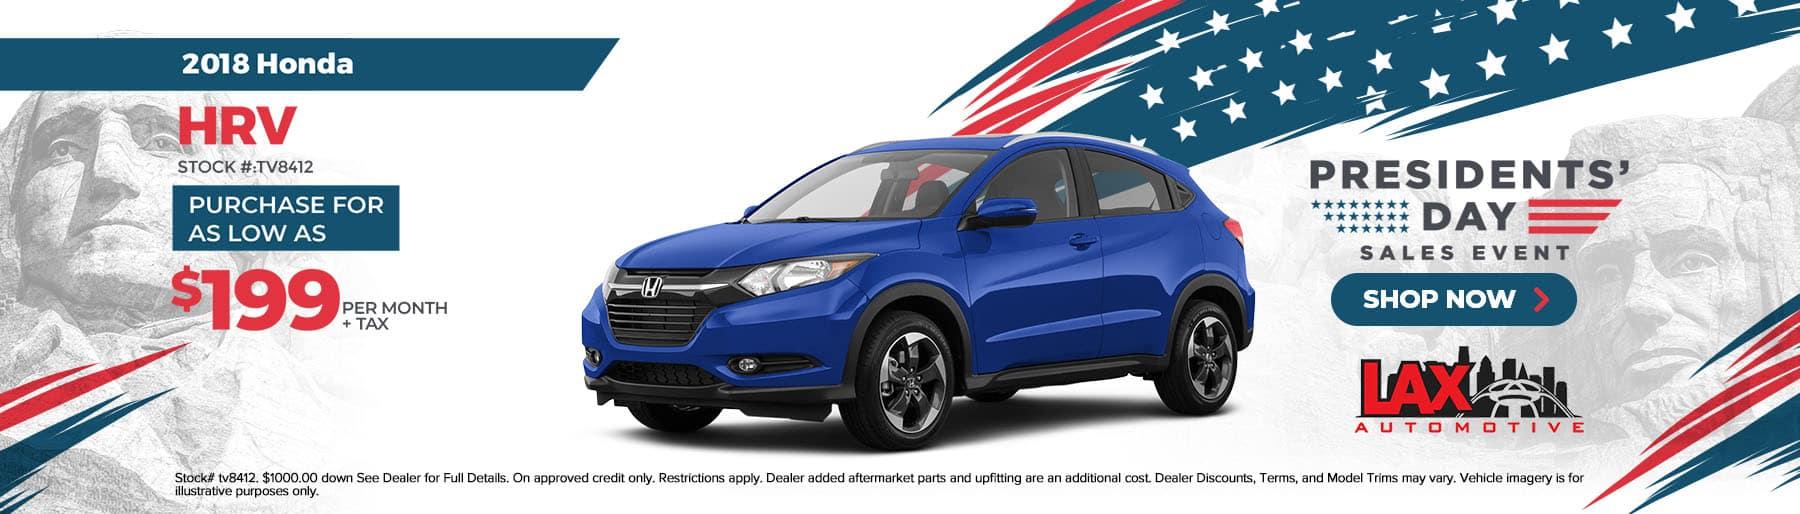 2021-02-Lax Automotive_Slide-1800×514 – 2018 Honda HRV